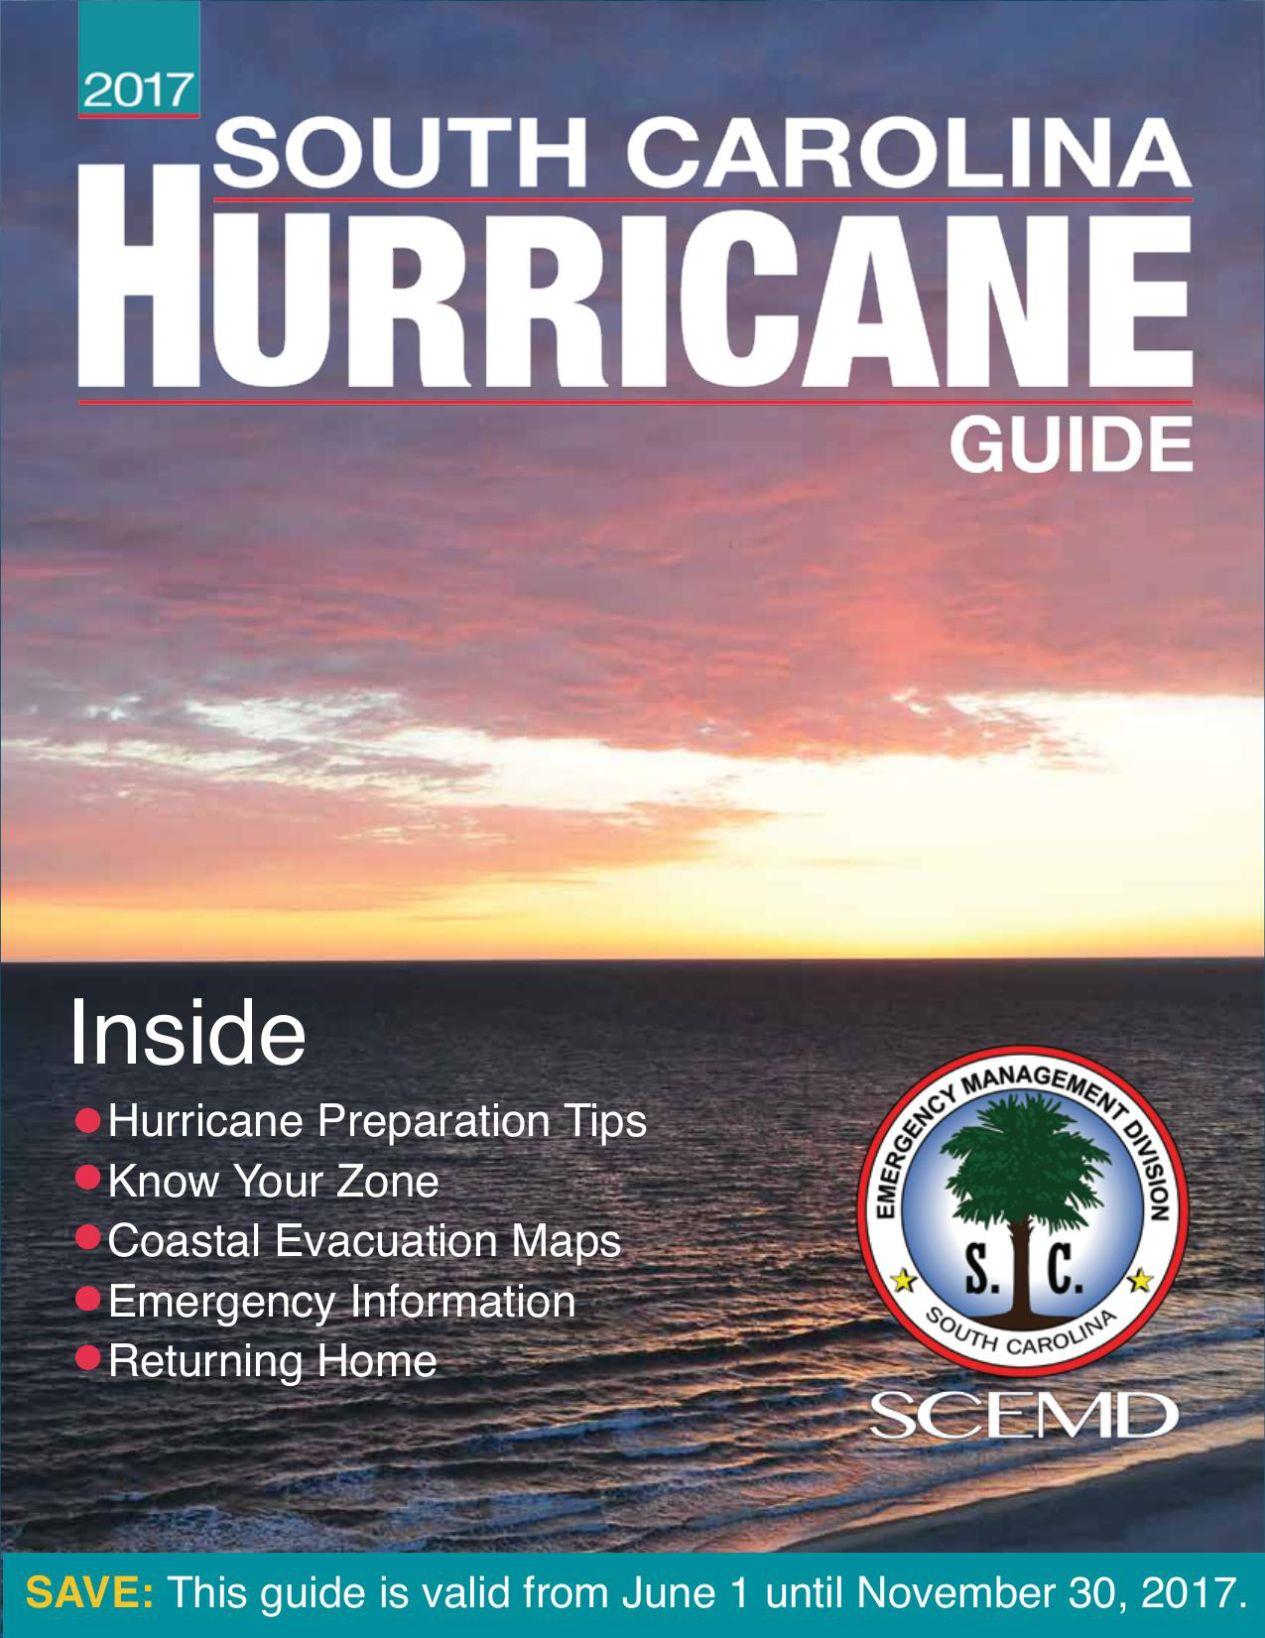 South Carolina Hurricane Guide Emergency preparedness checklist